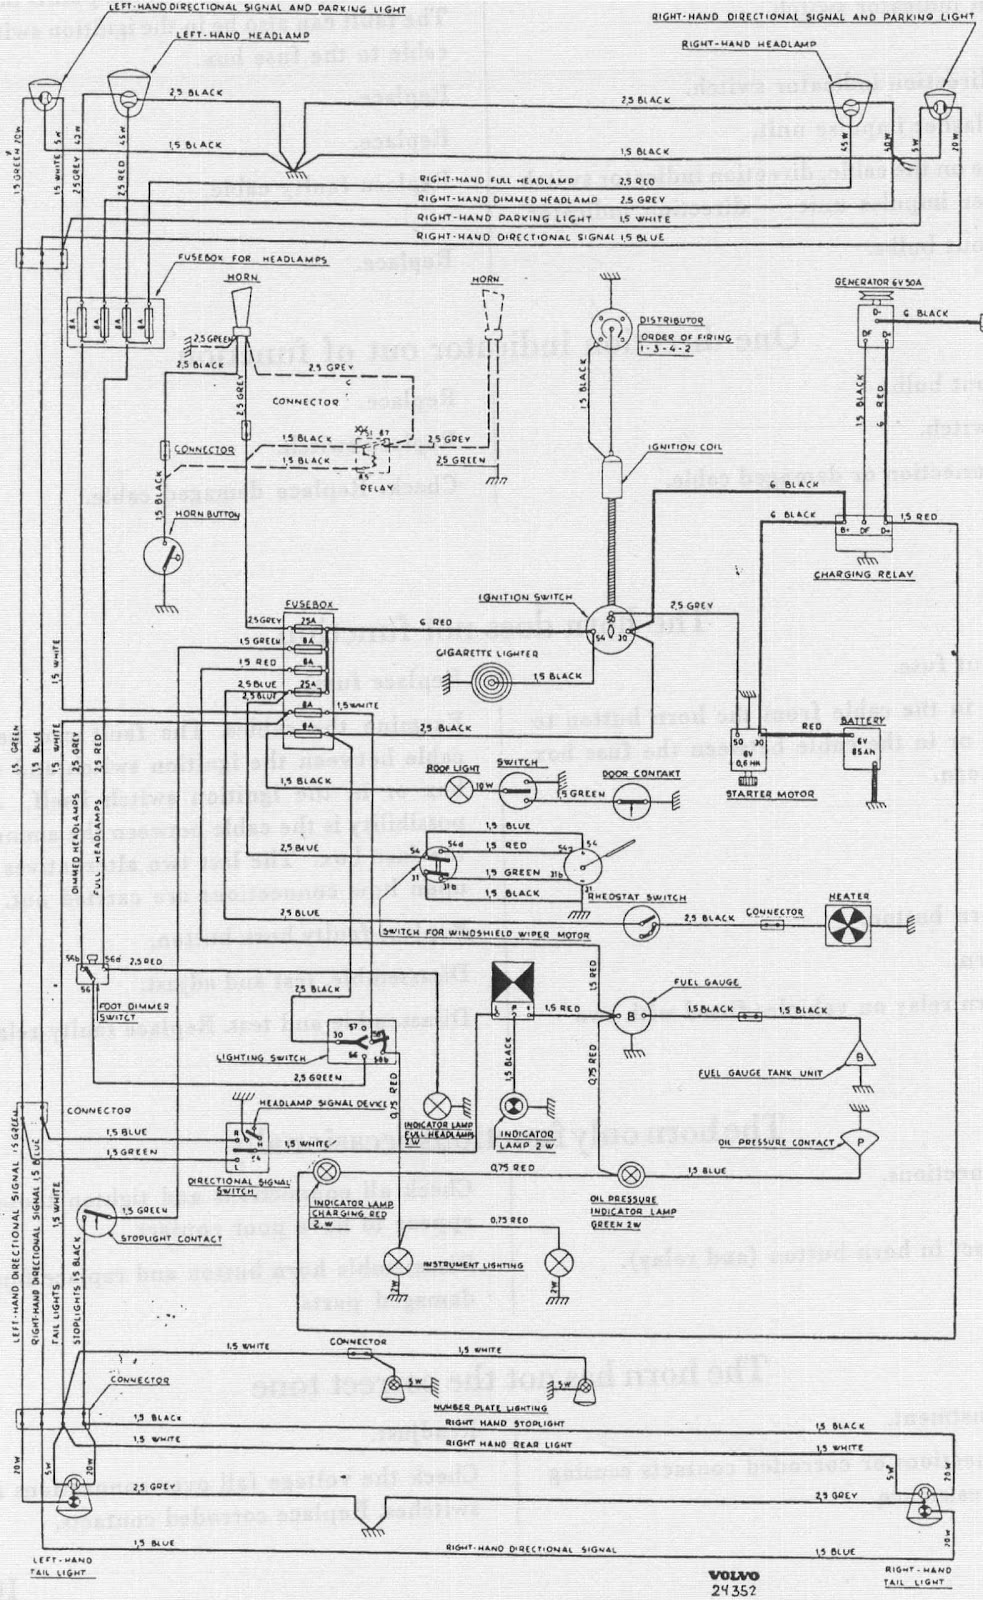 Lovely Vn V8 Wiring Diagram a bus topology